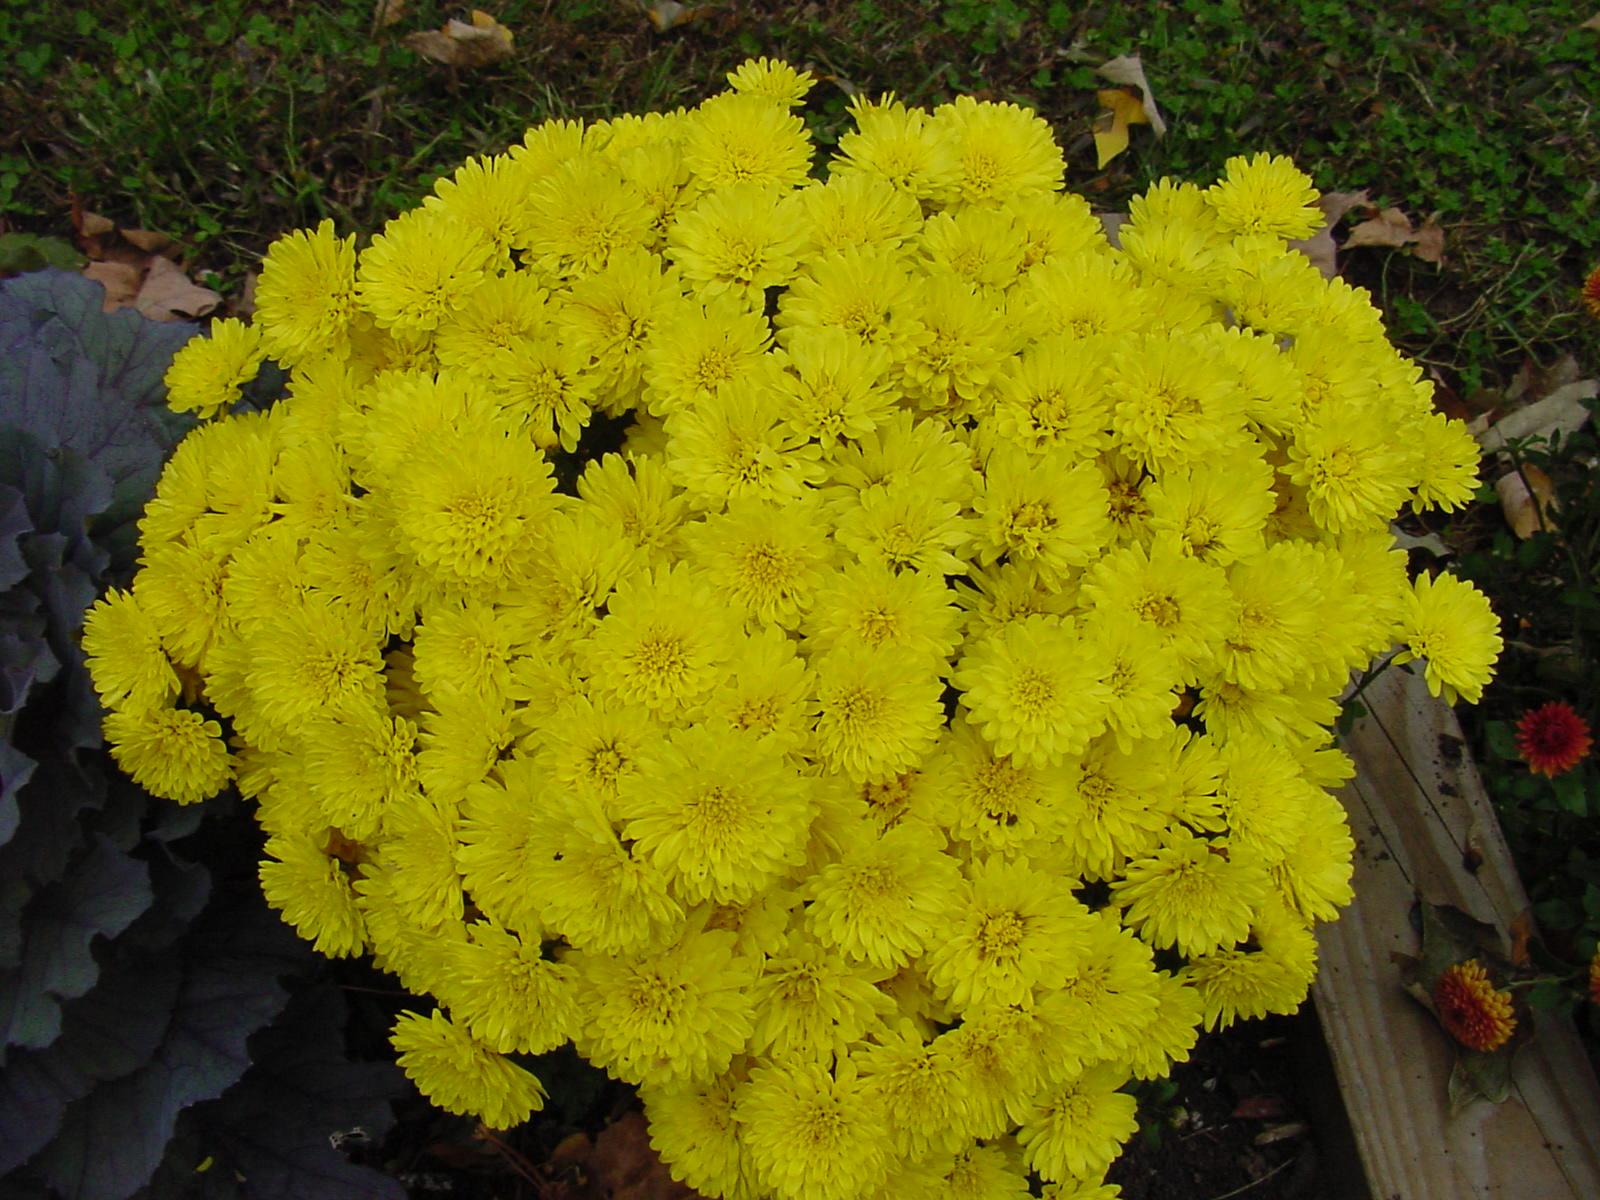 Beautiful Flowers: cherysanthmum